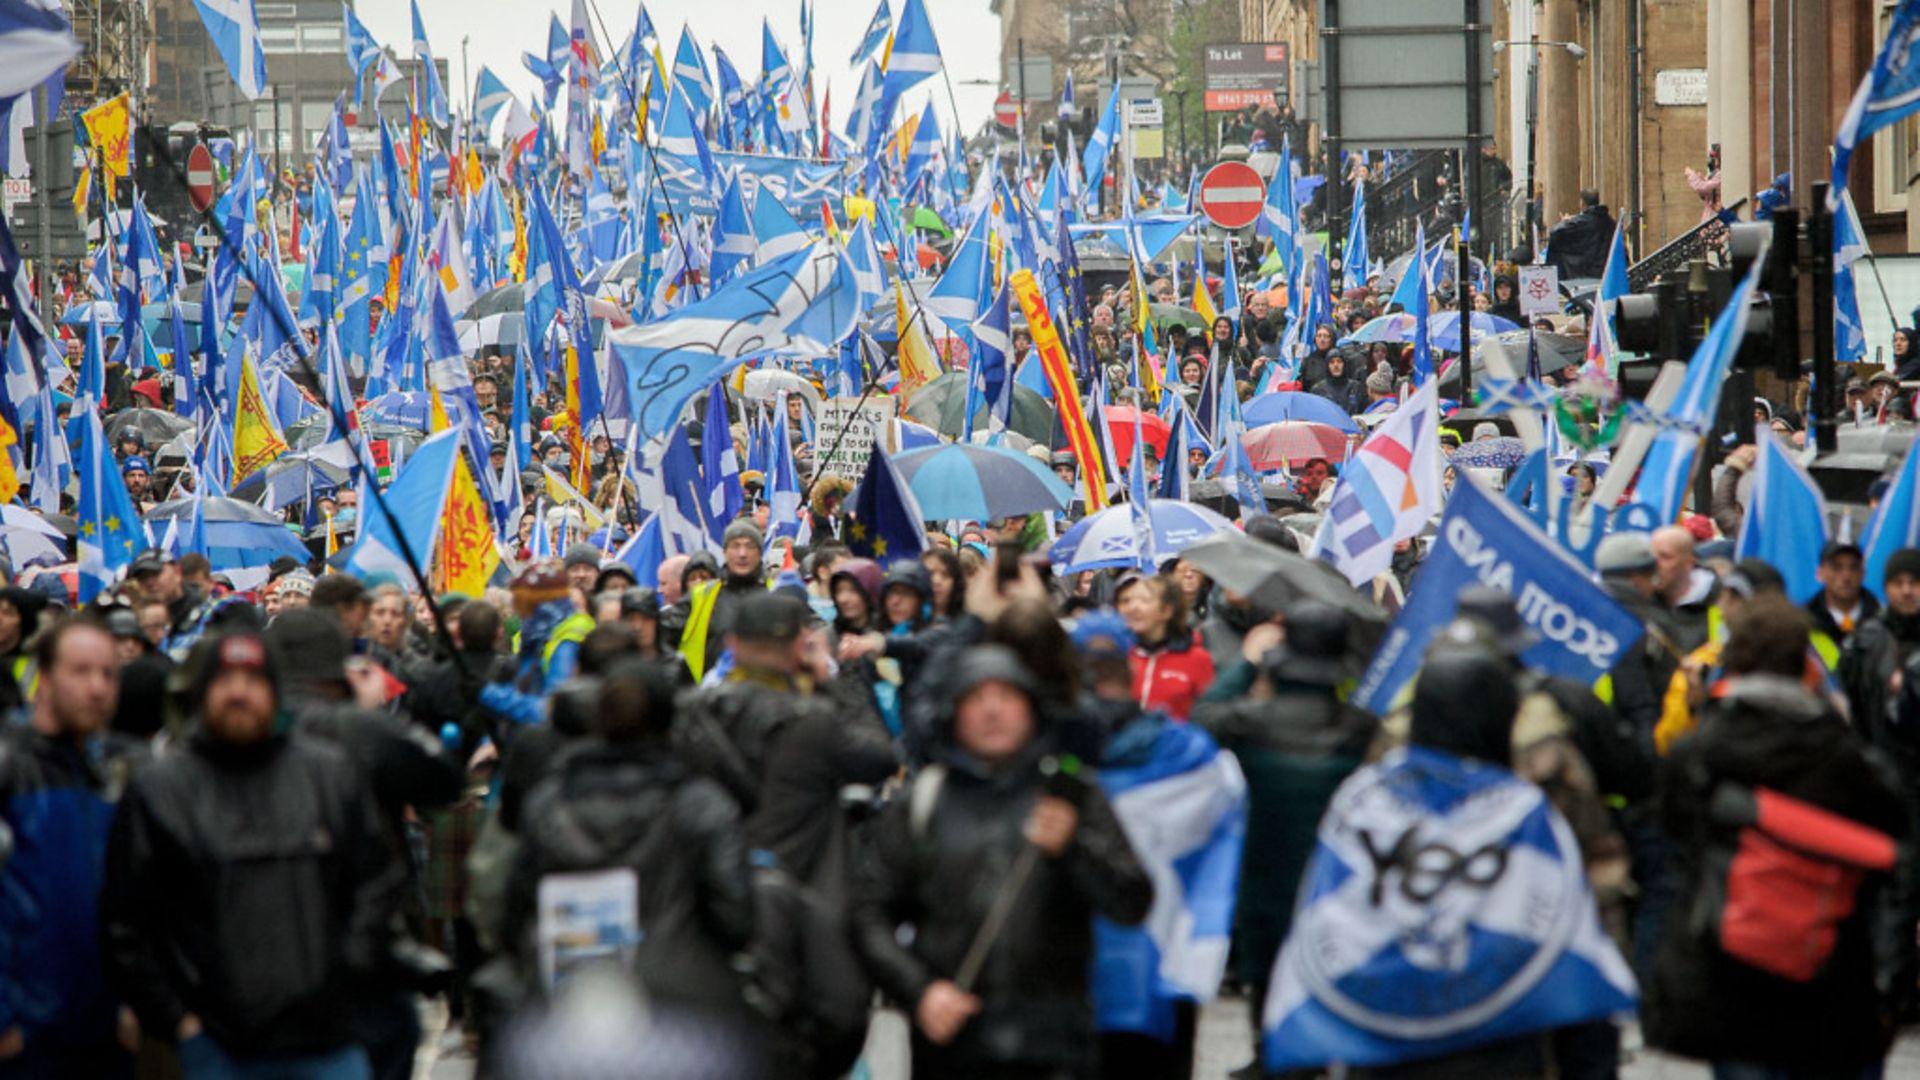 Unstoppable march? Scottish independence demonstrators in Glasgow, in January 2020 - Credit: SOPA Images/LightRocket via Gett